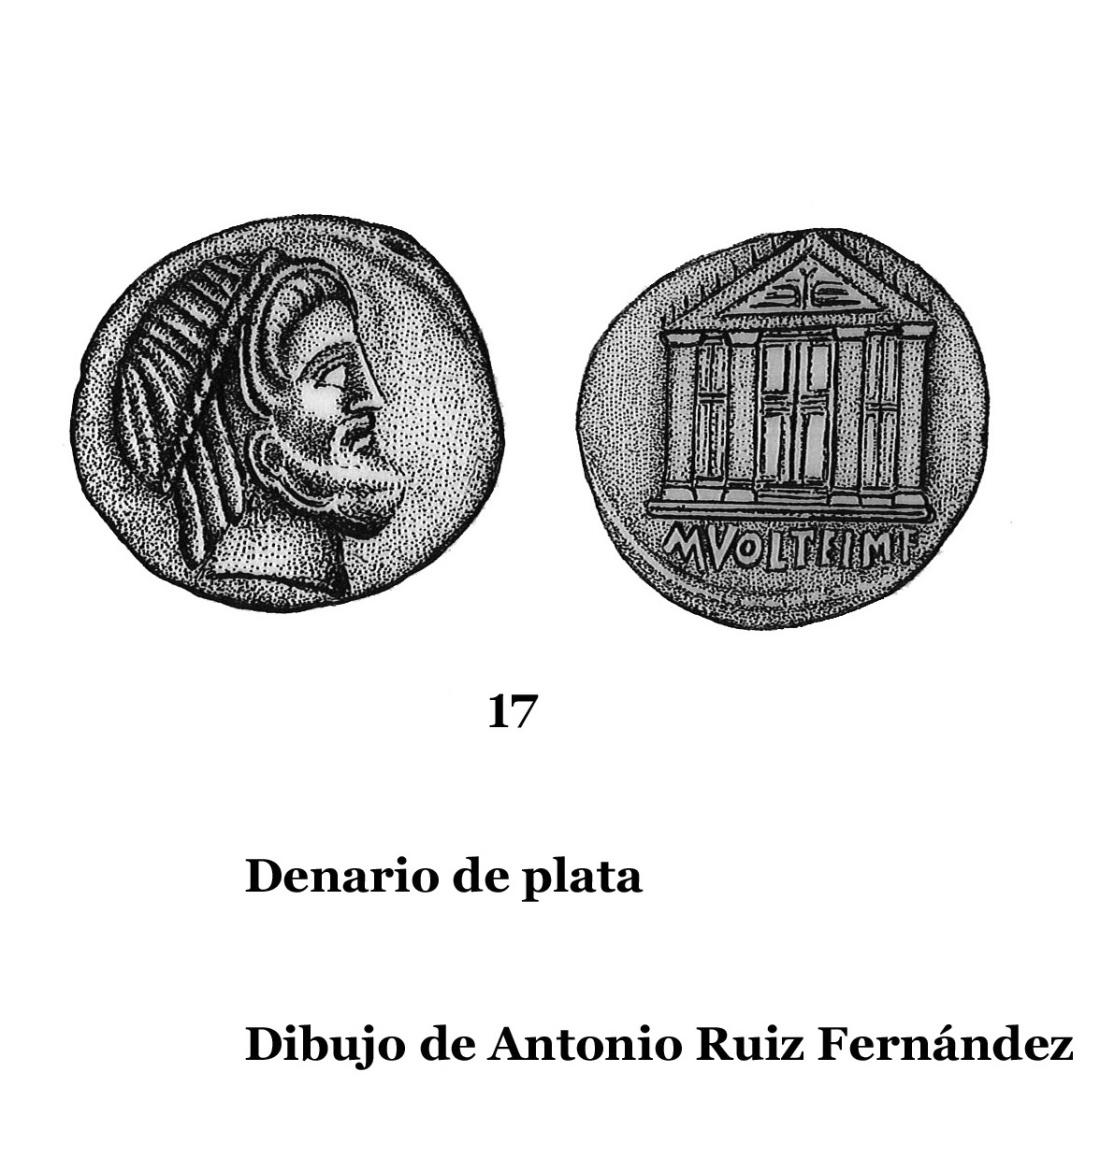 17DENARIOS DE PLATA, DIBUJOS 17